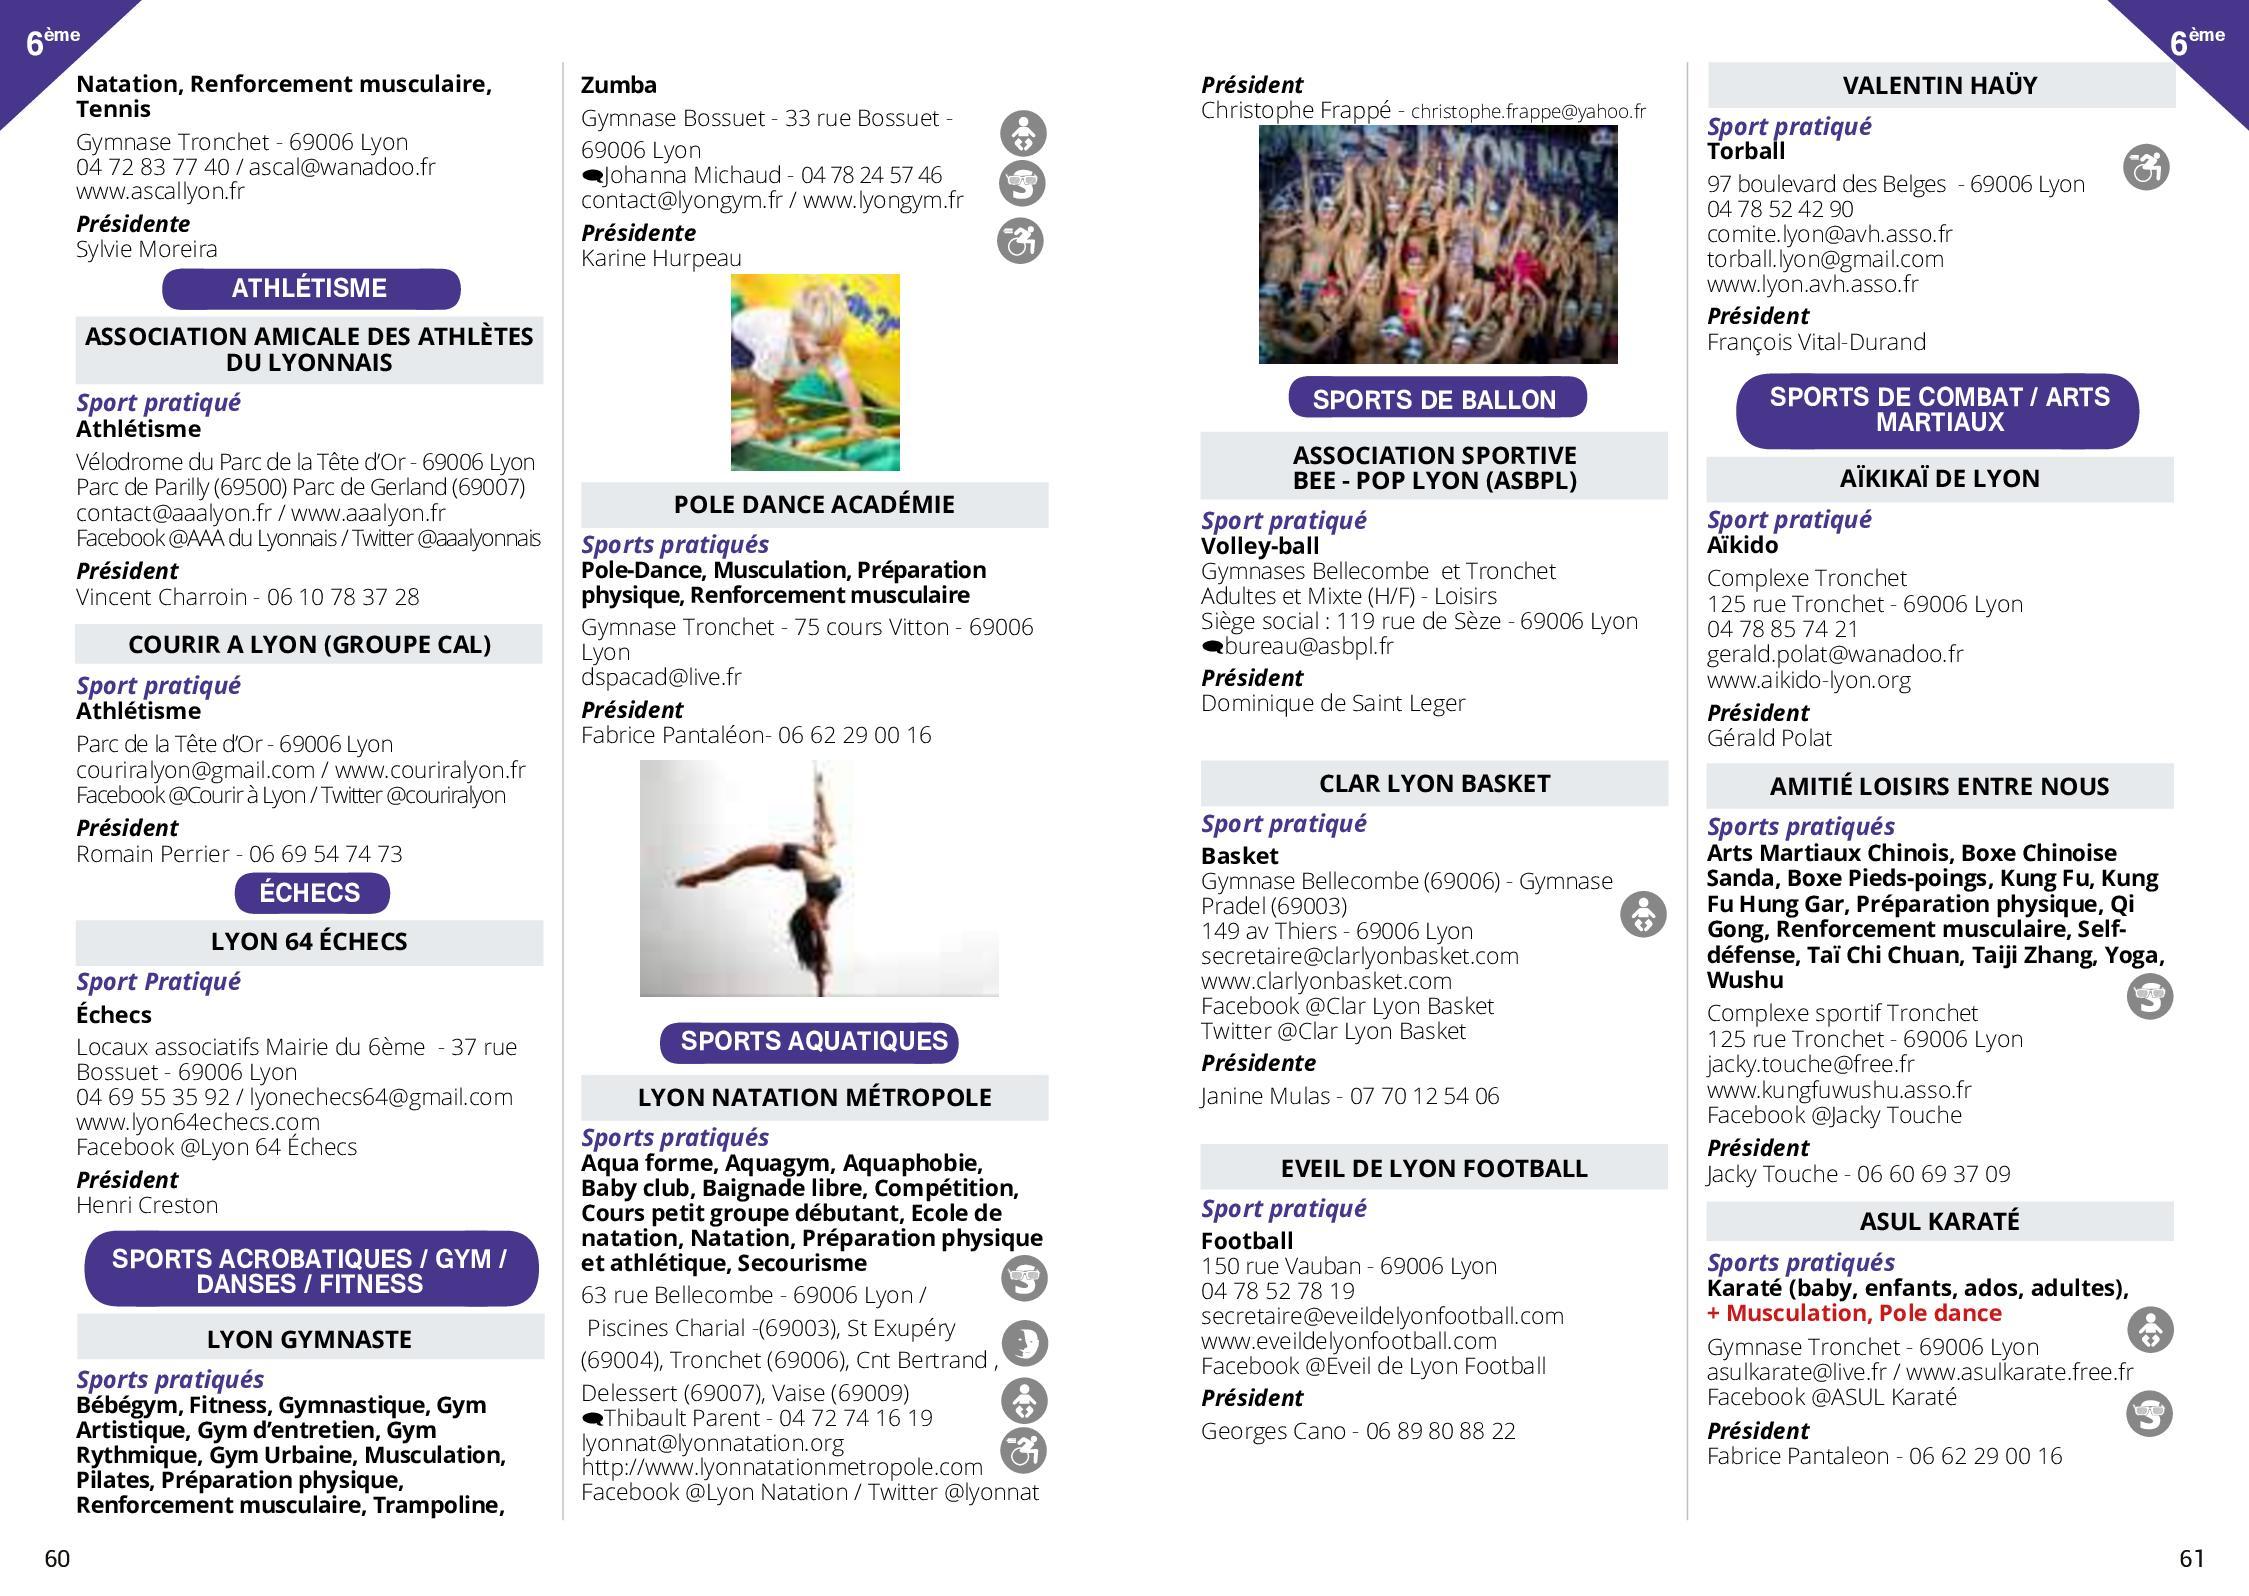 Guide Des Sports De Lyon 2018 2019 - Calameo Downloader concernant Piscine Charial